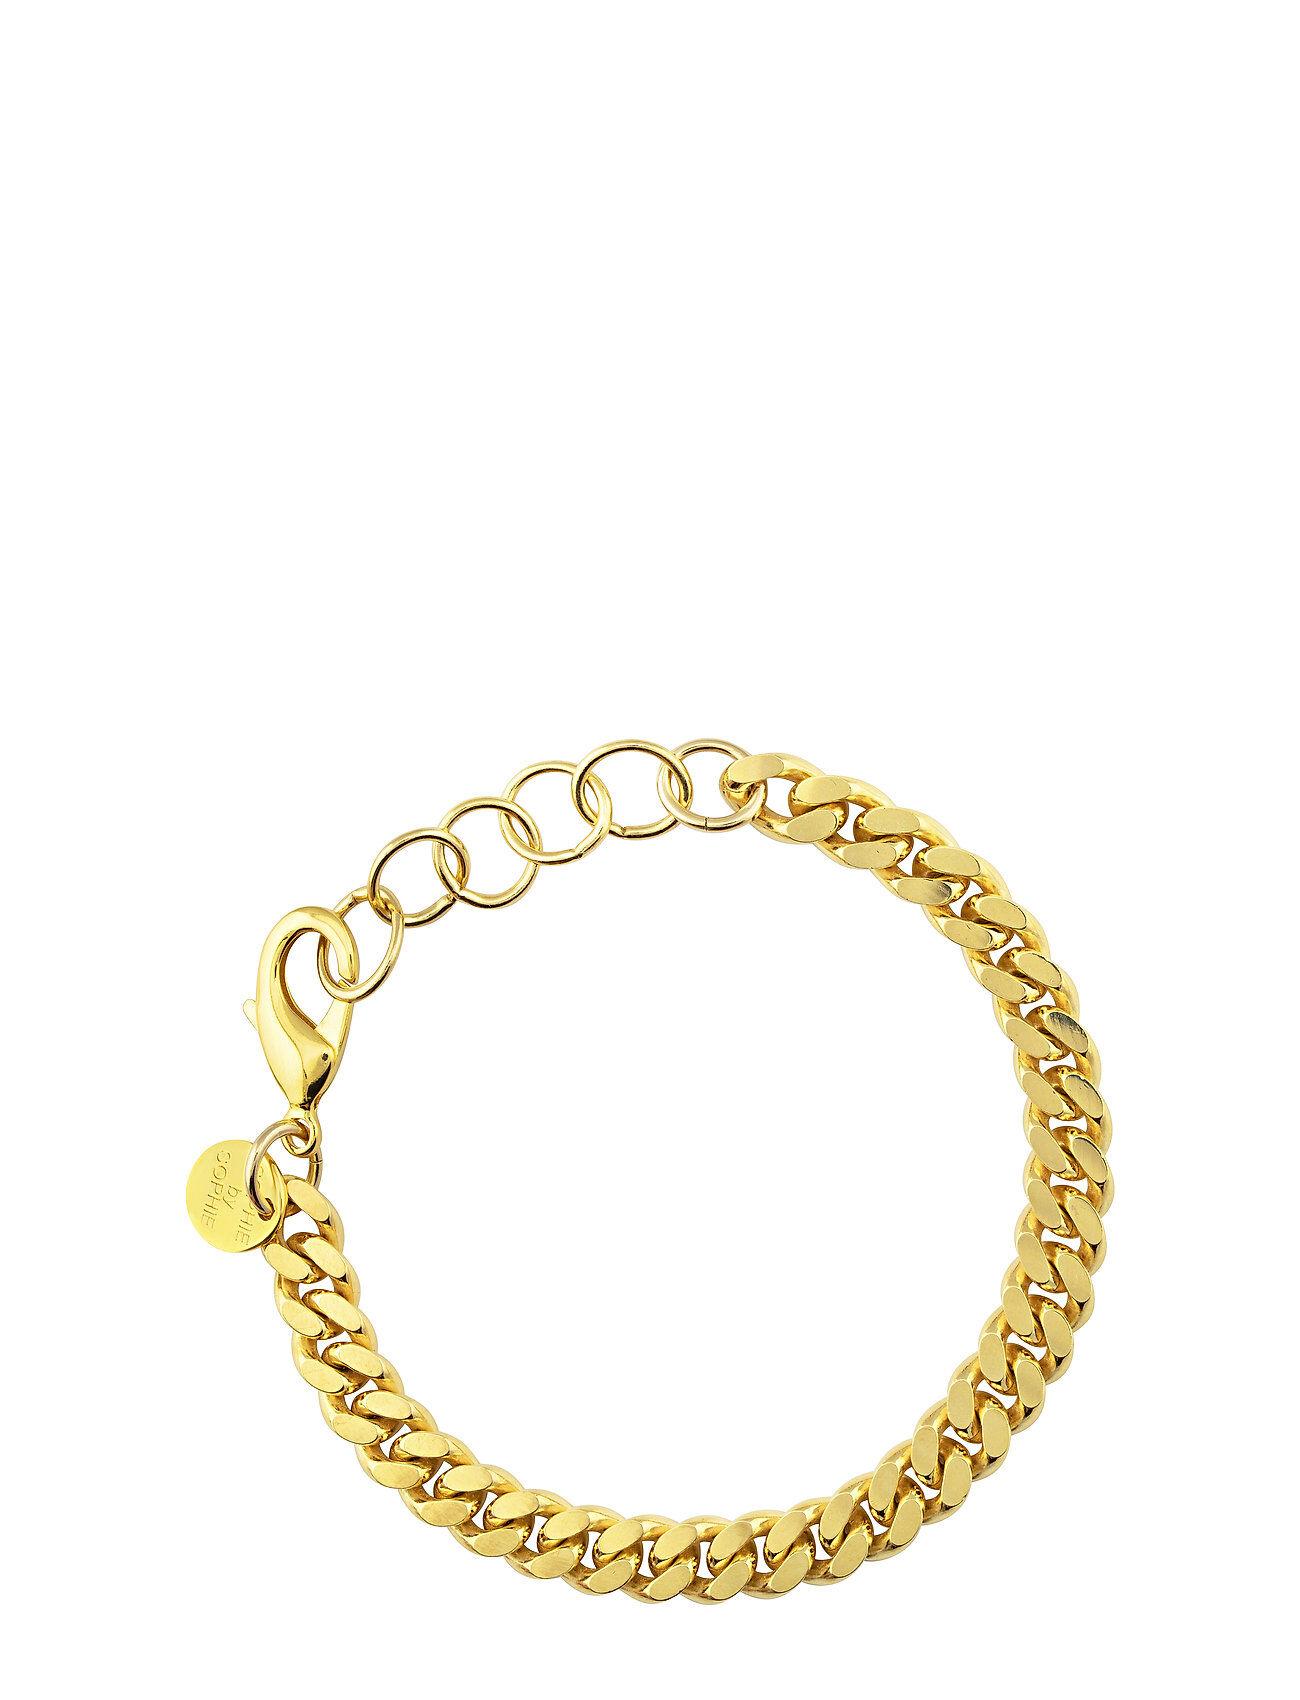 SOPHIE by SOPHIE Pansar Thin Bracelet Accessories Jewellery Bracelets Chain Bracelets Kulta SOPHIE By SOPHIE